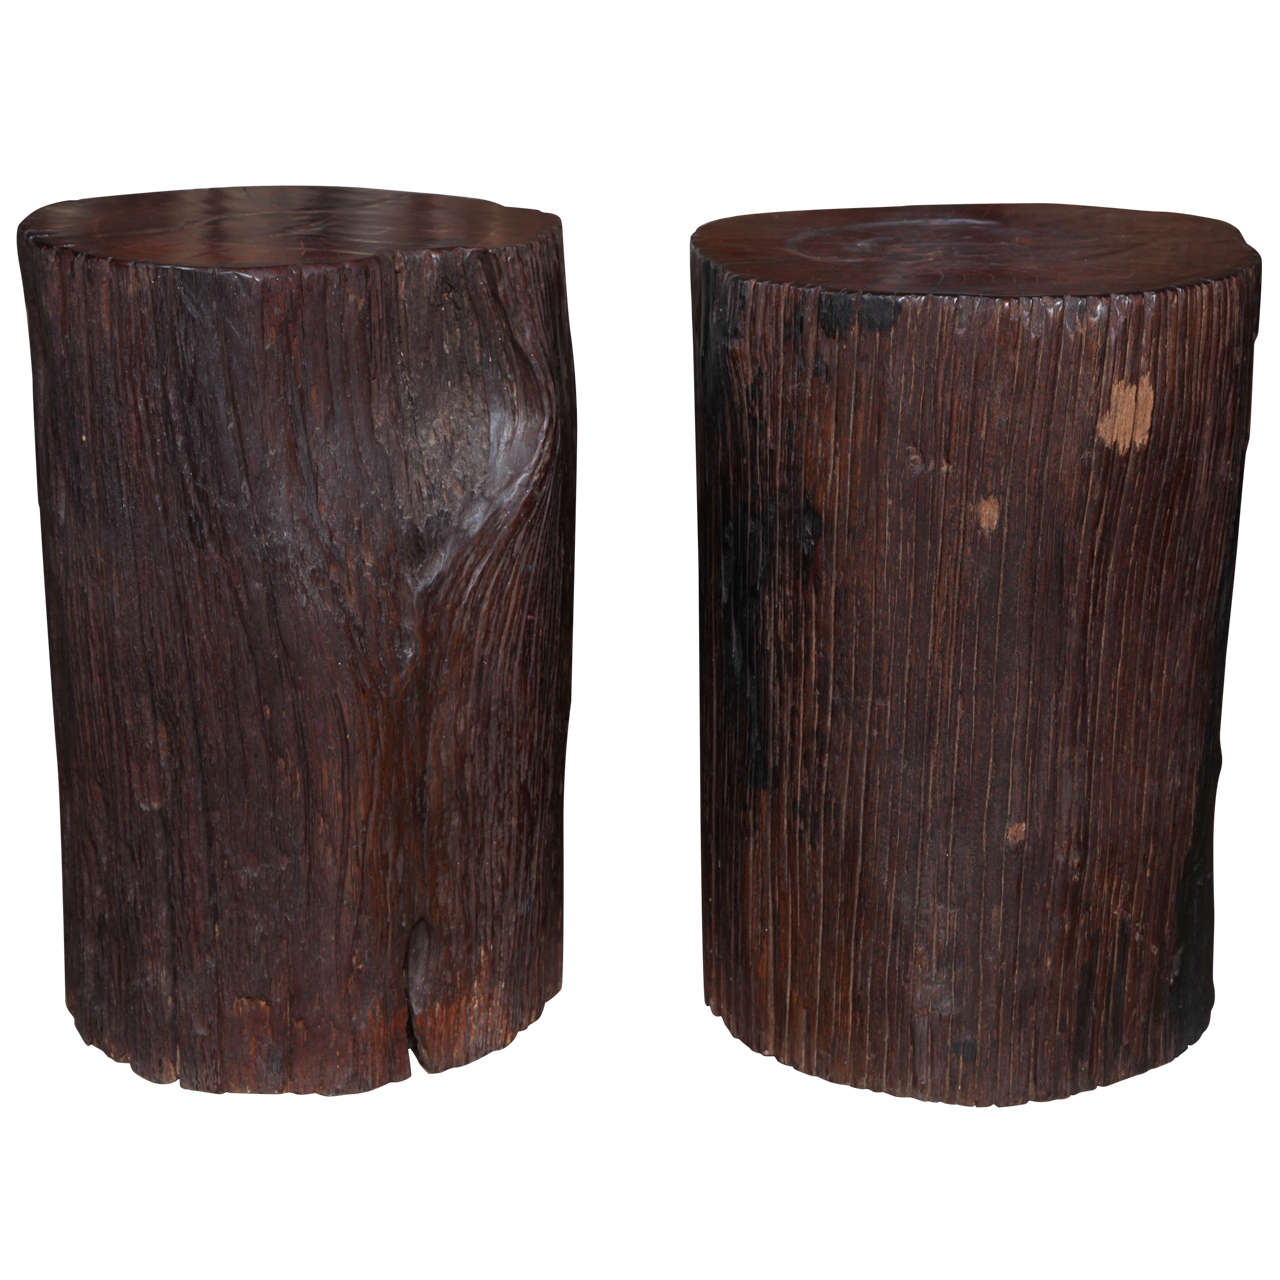 Teak Wood Trunk Table